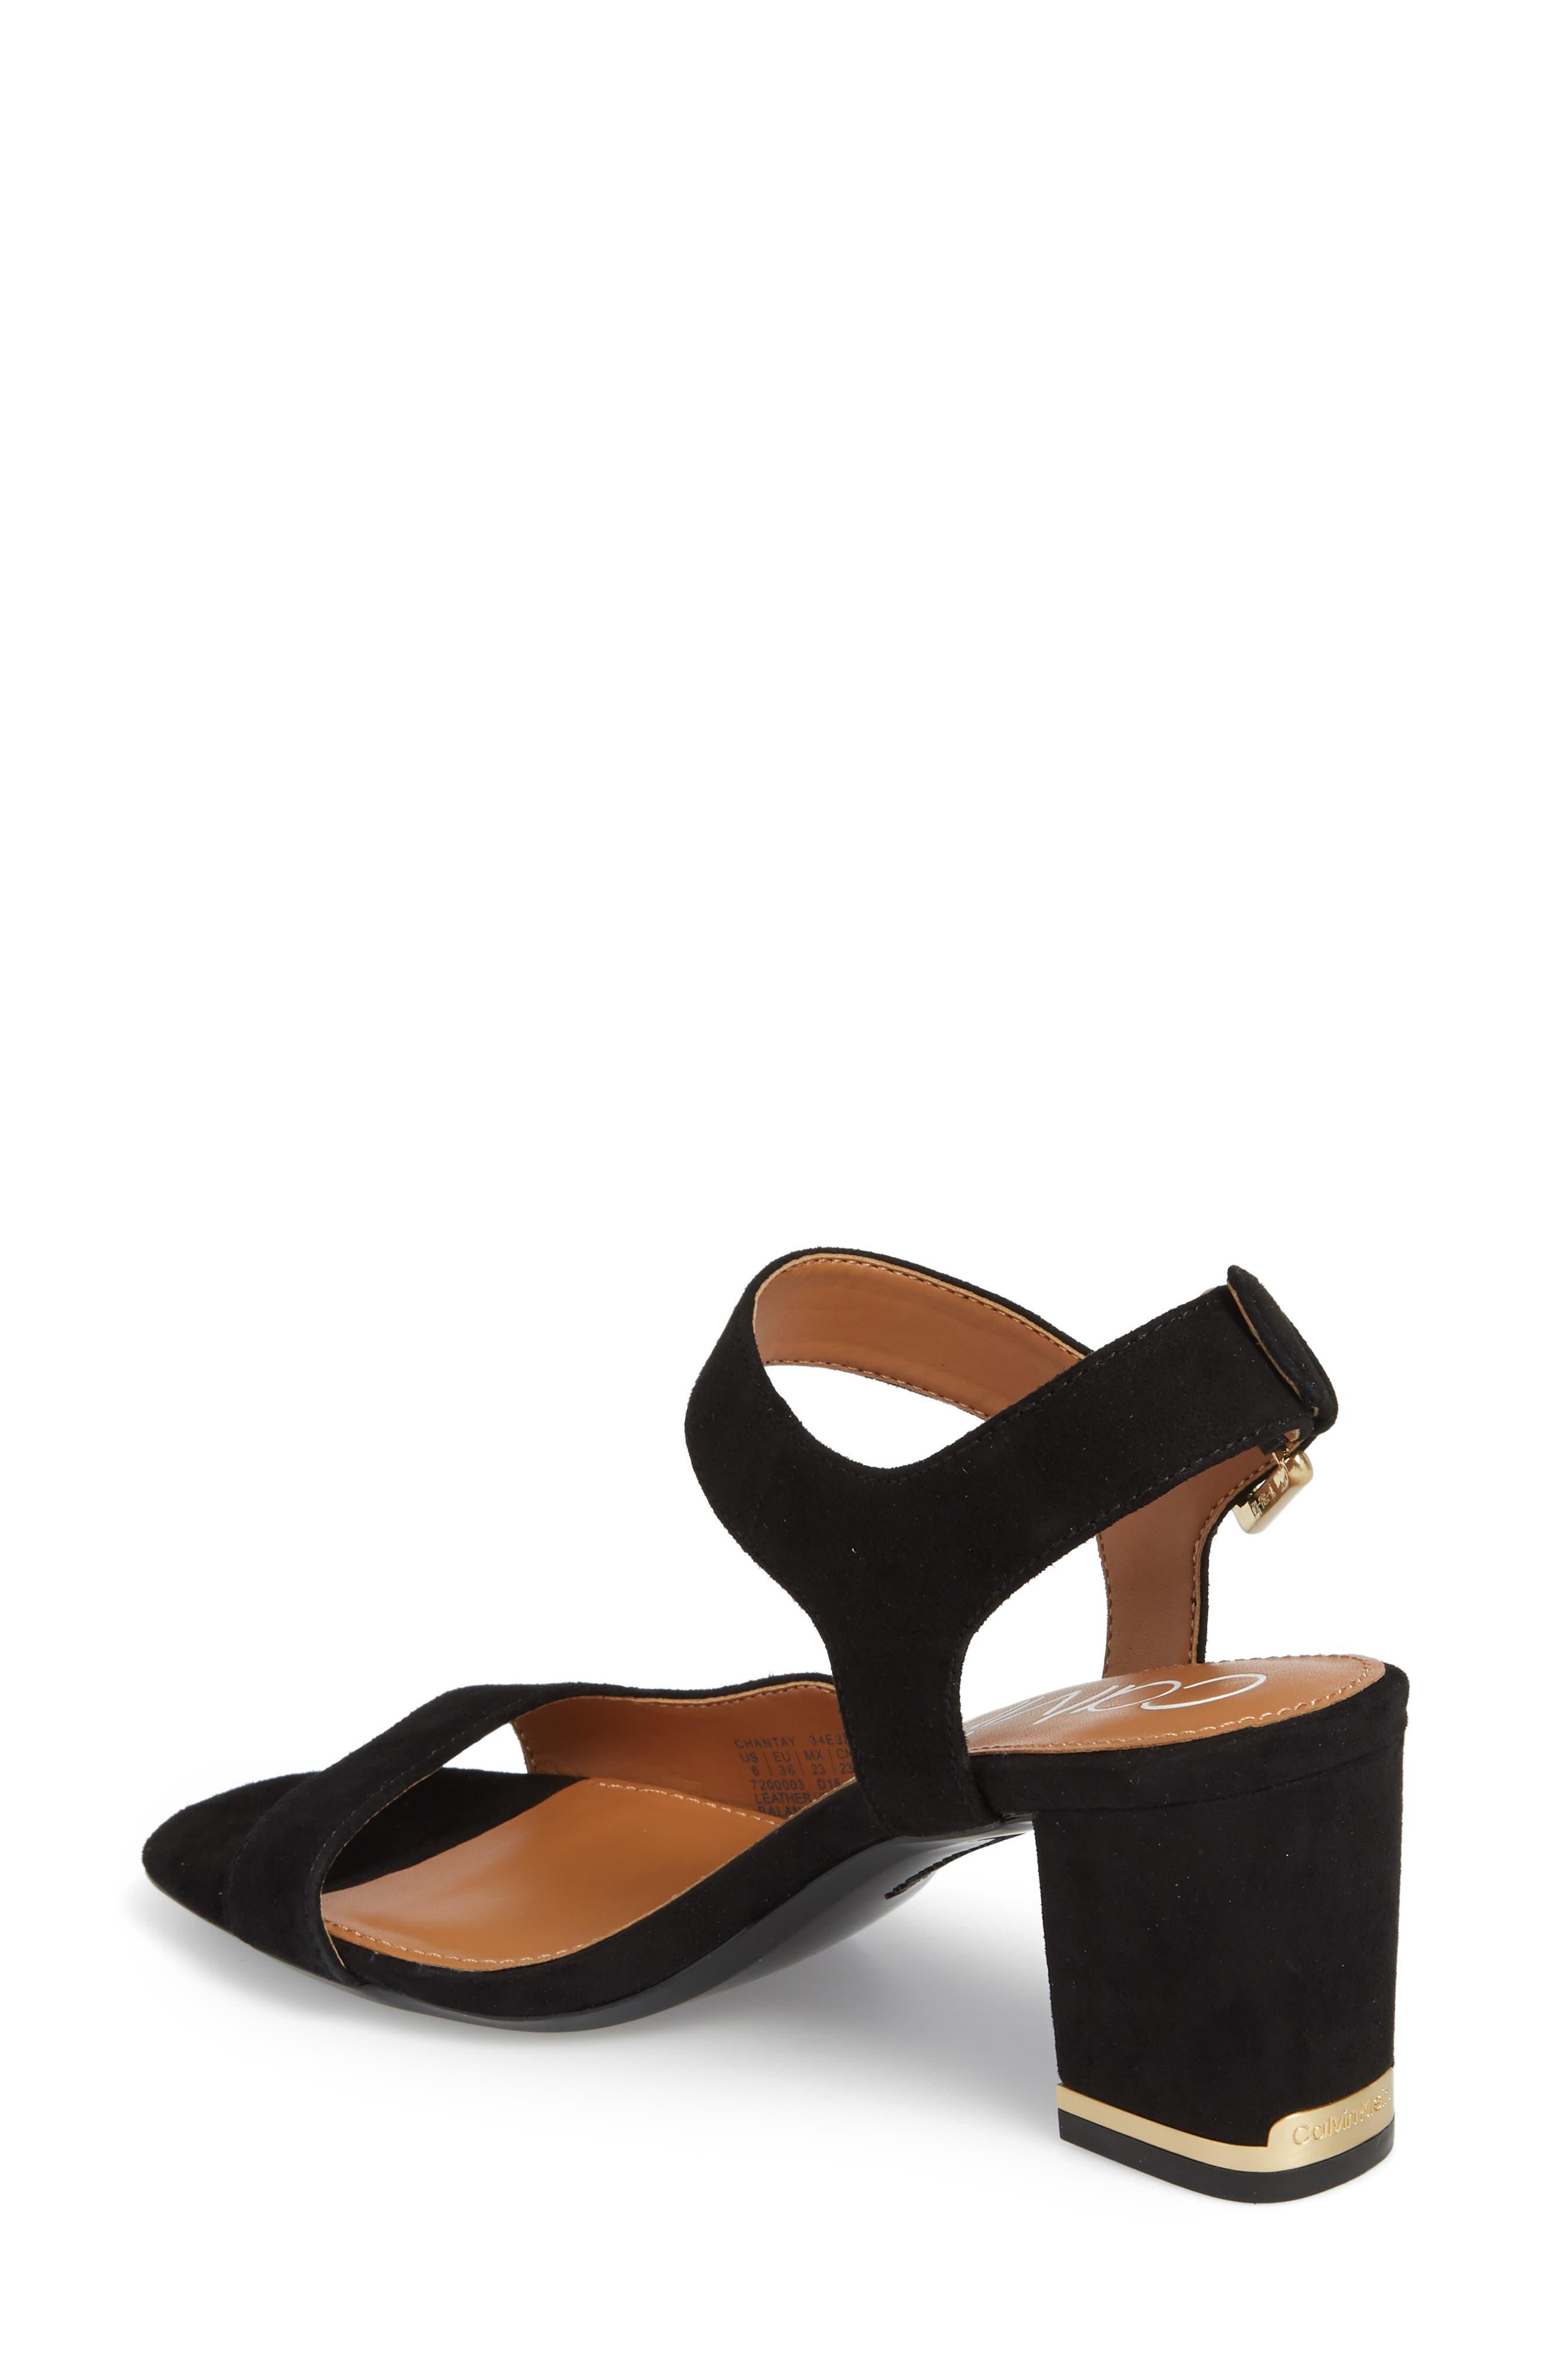 Chantay Asymmetrical Sandal,                             Alternate thumbnail 2, color,                             001